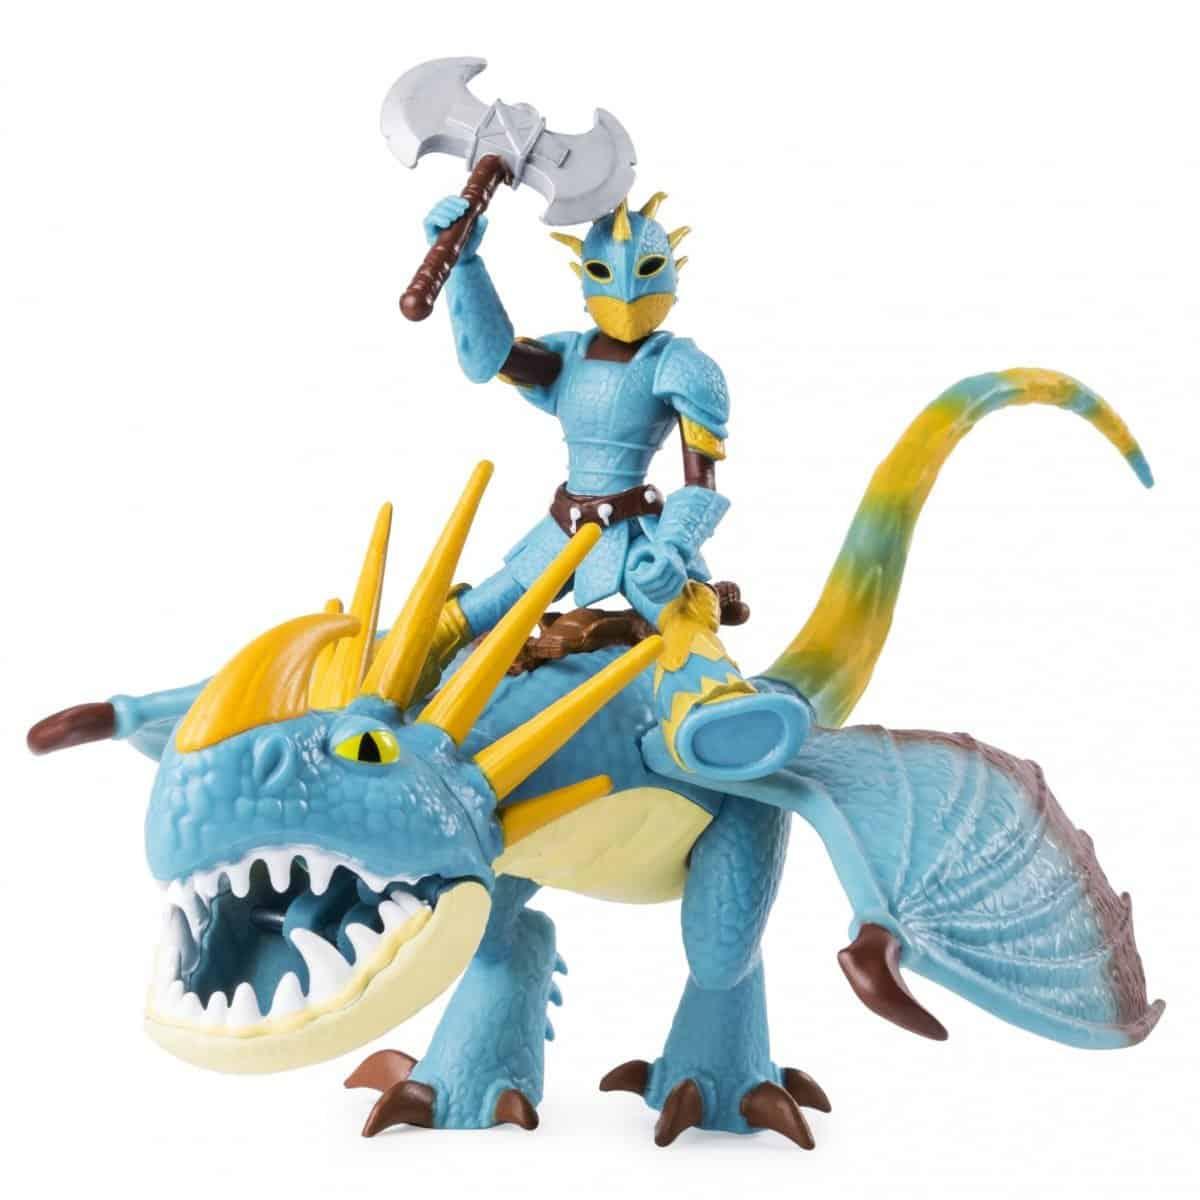 Dragon and viking figure set